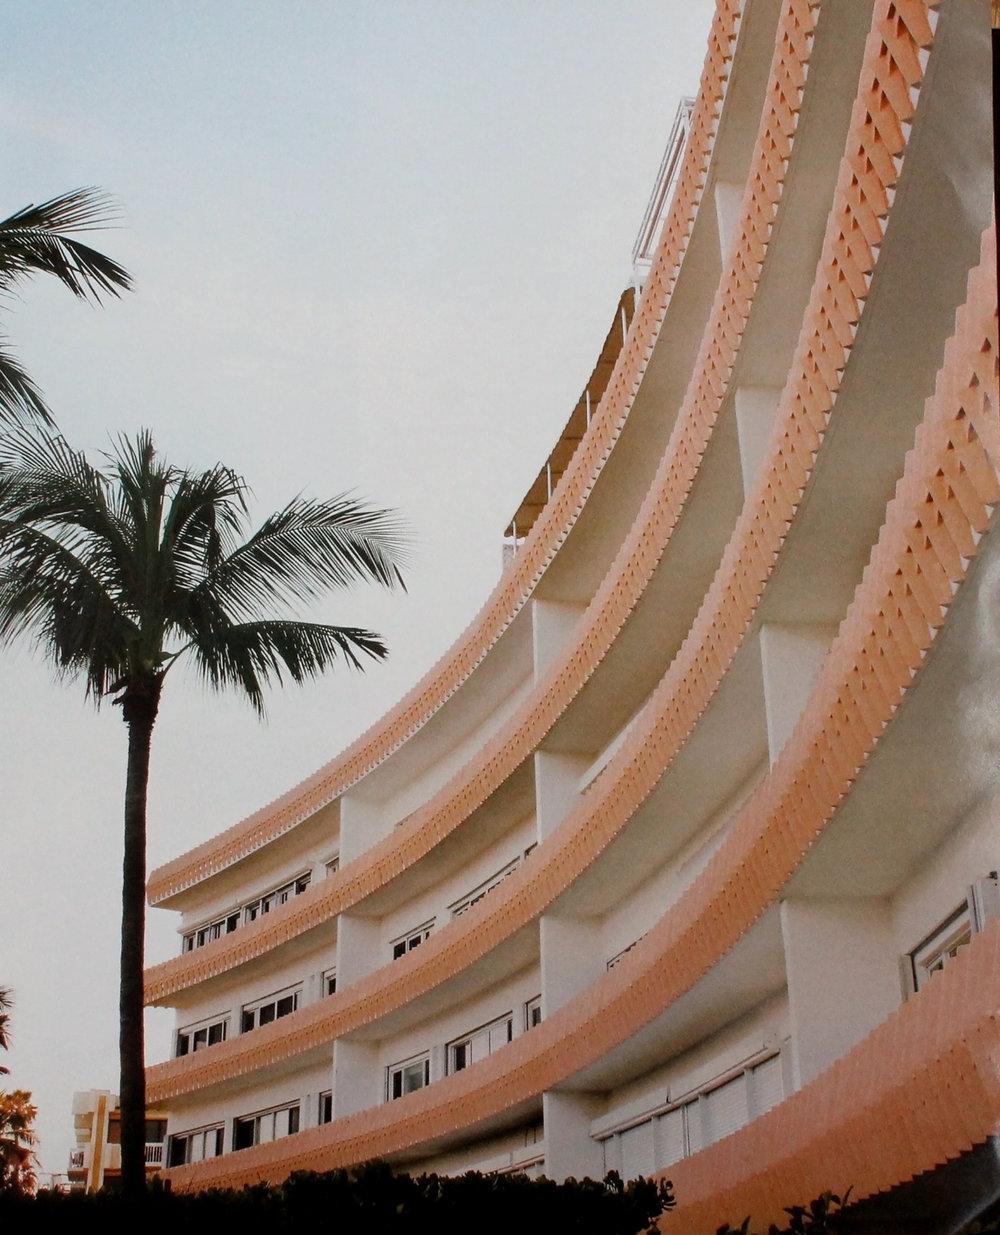 palmspringhome